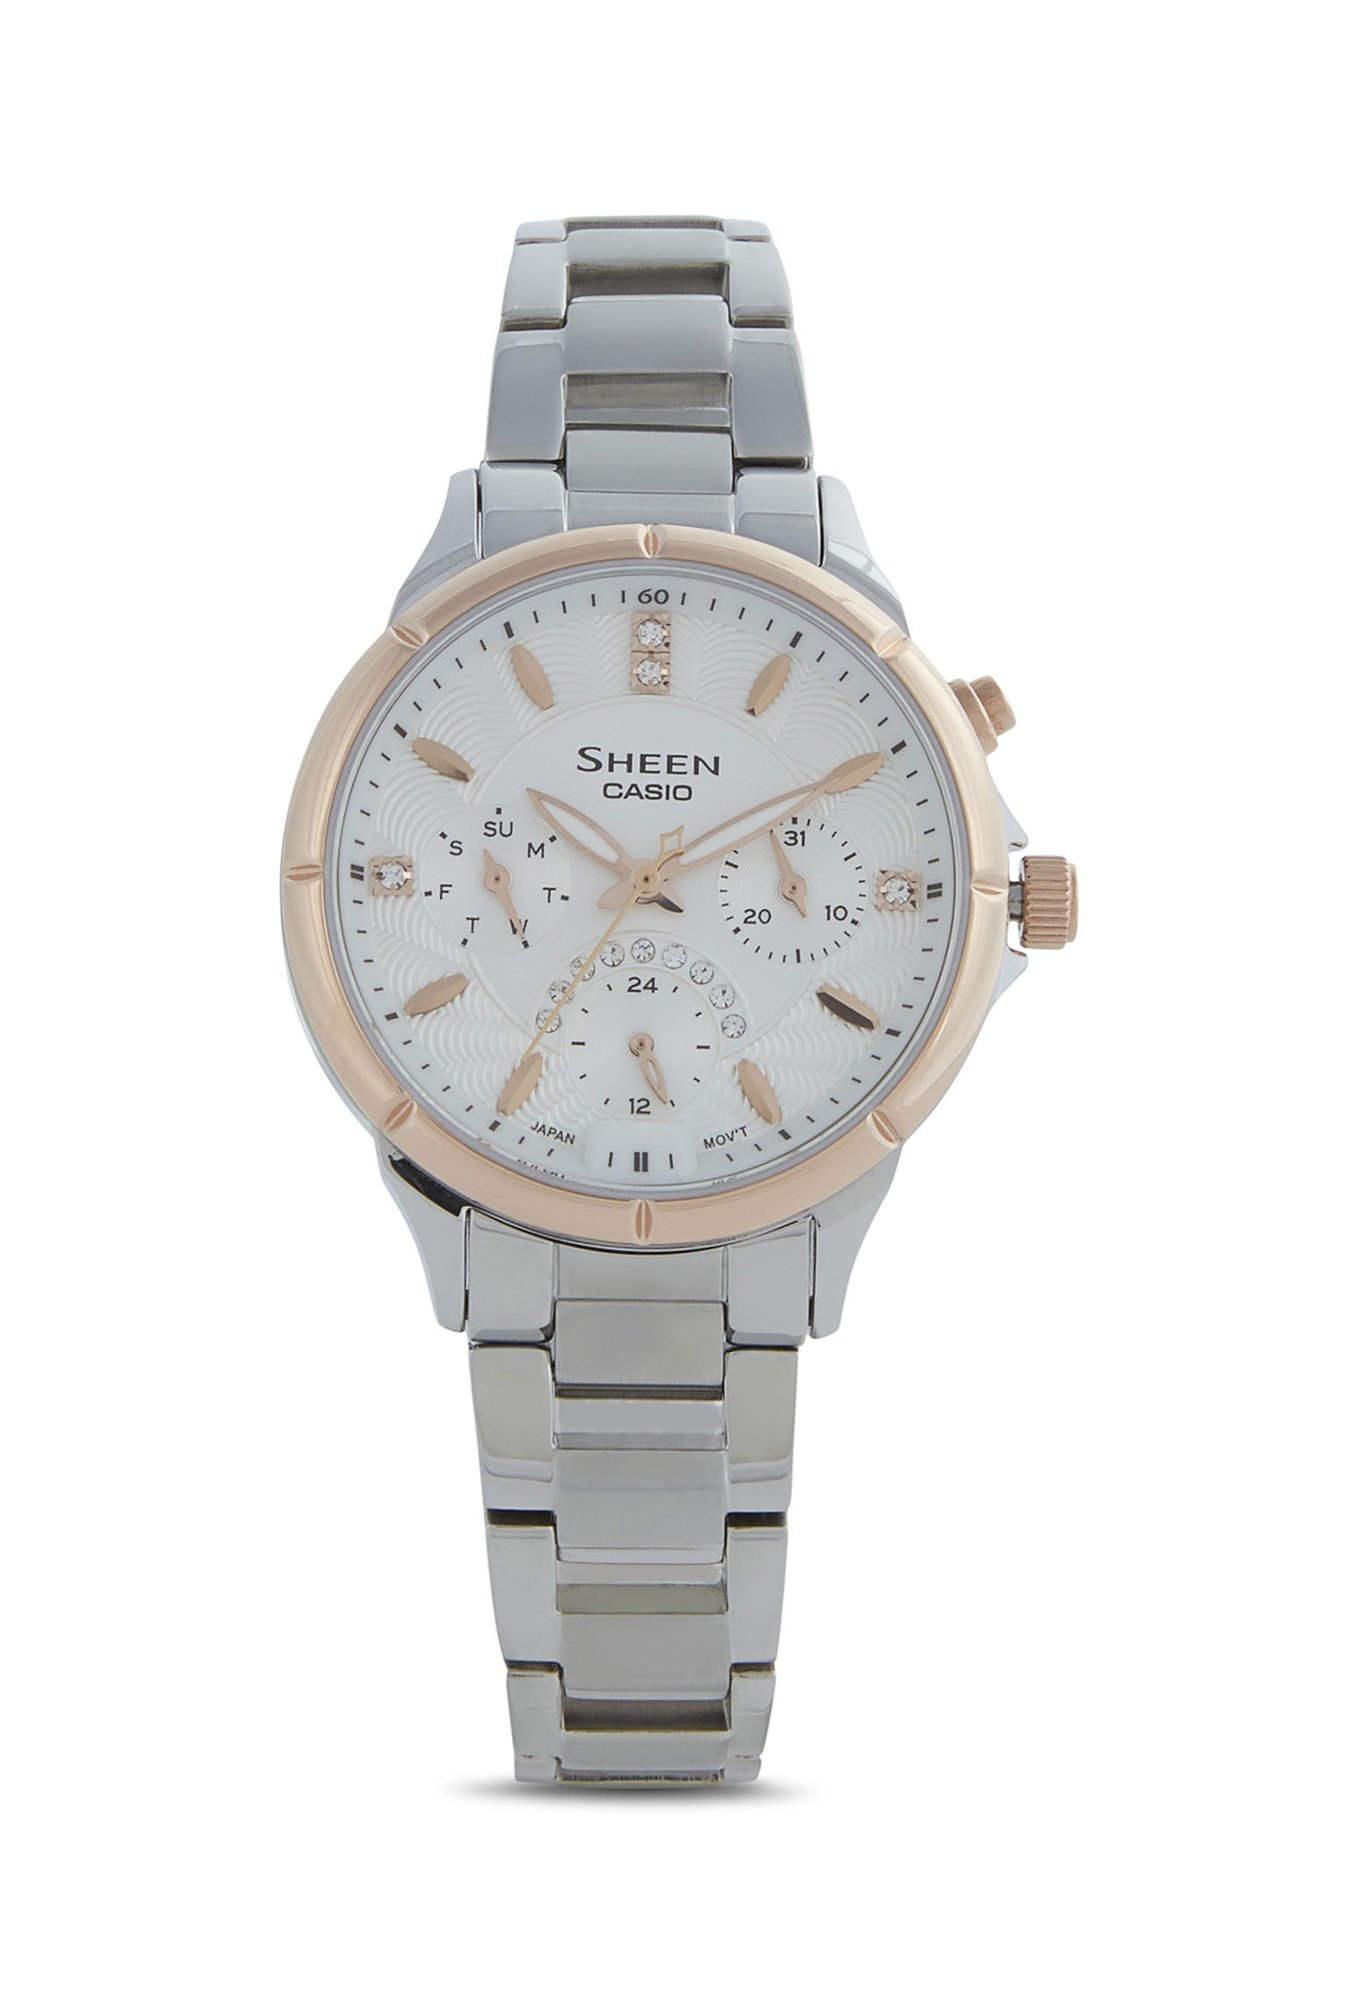 Casio Sheen SHE-3047SG-7AUDR (SX167) Analog White Dial Women's Watch (SHE-3047SG-7AUDR (SX167))